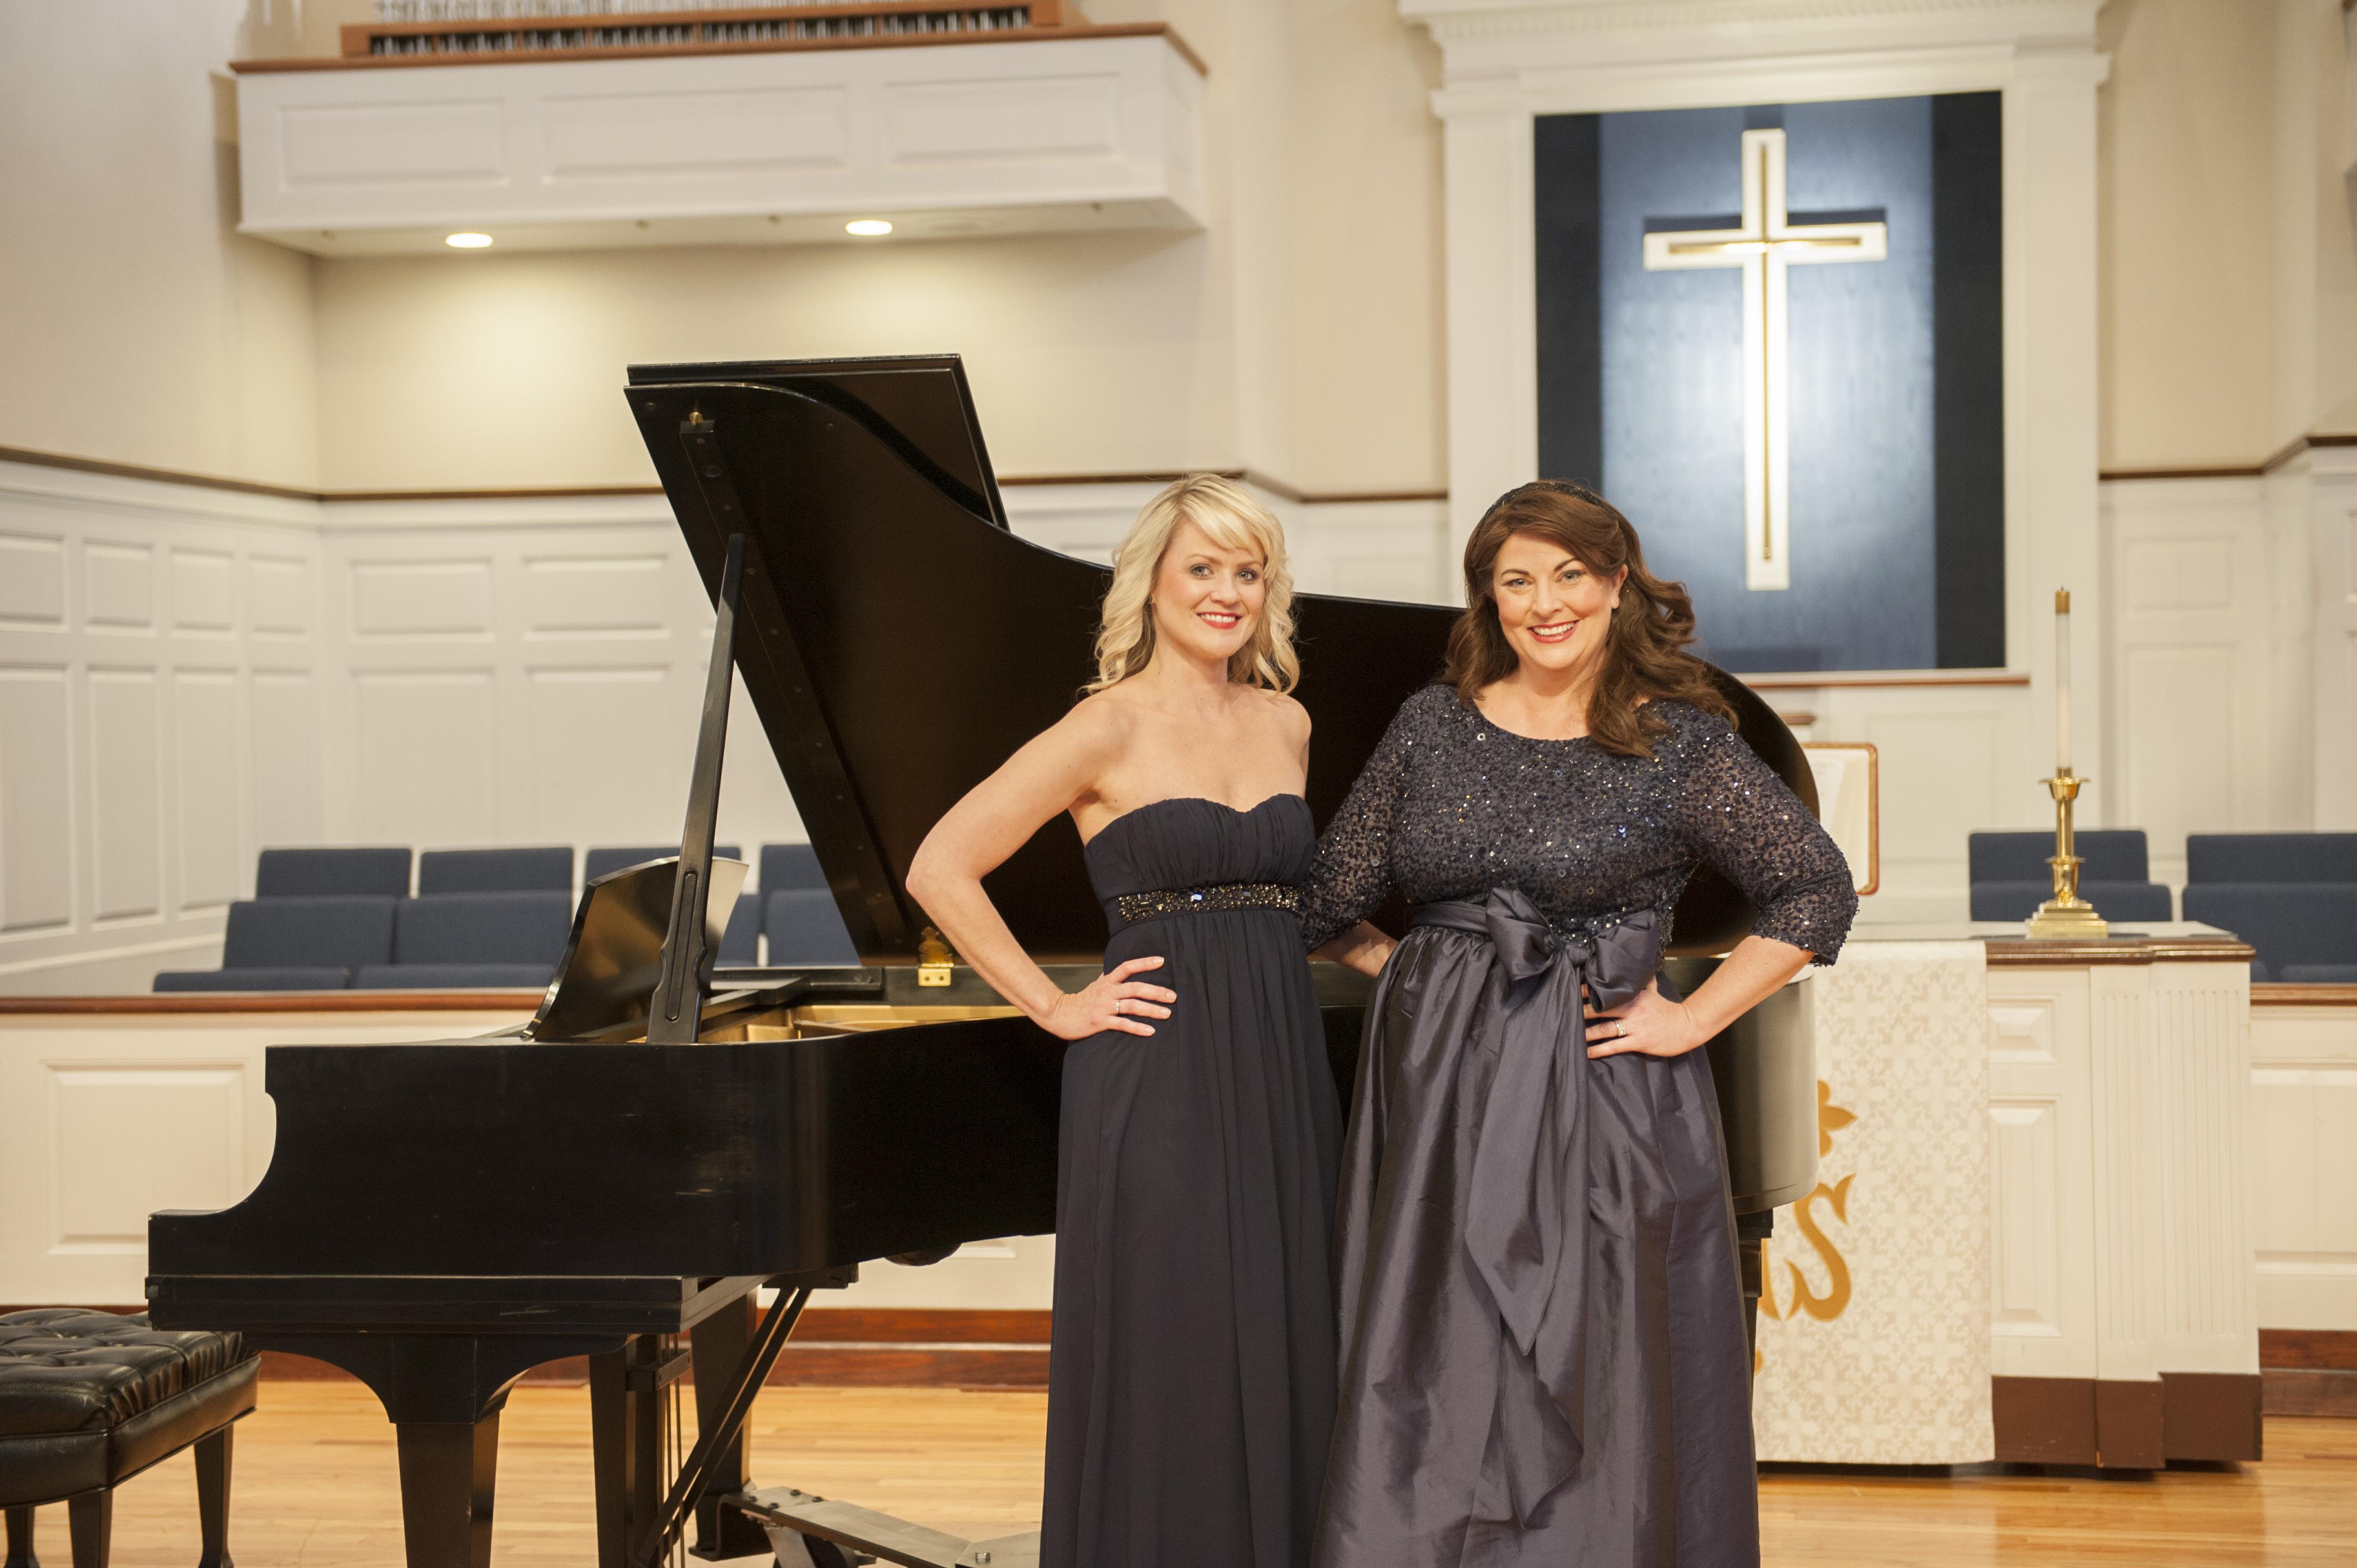 Johanna and Robyn